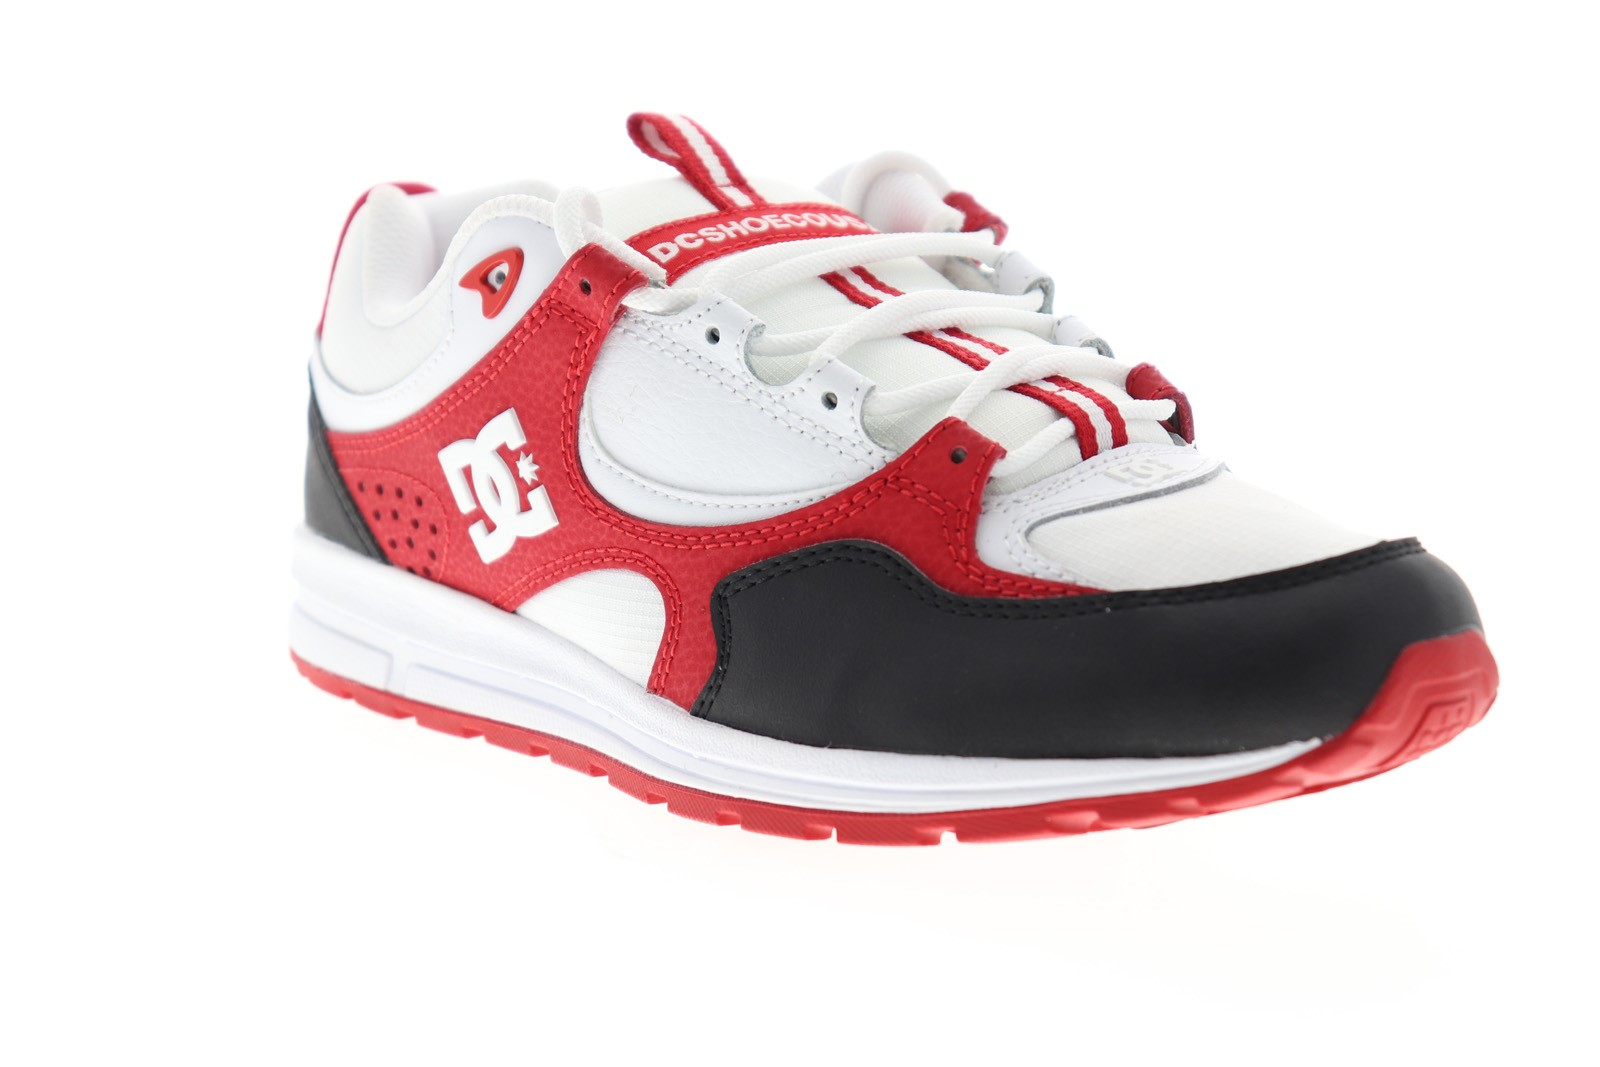 DC - DC Kalis Lite Mens White Red Leather Lace Up Athletic Skate Shoes -  Walmart.com - Walmart.com